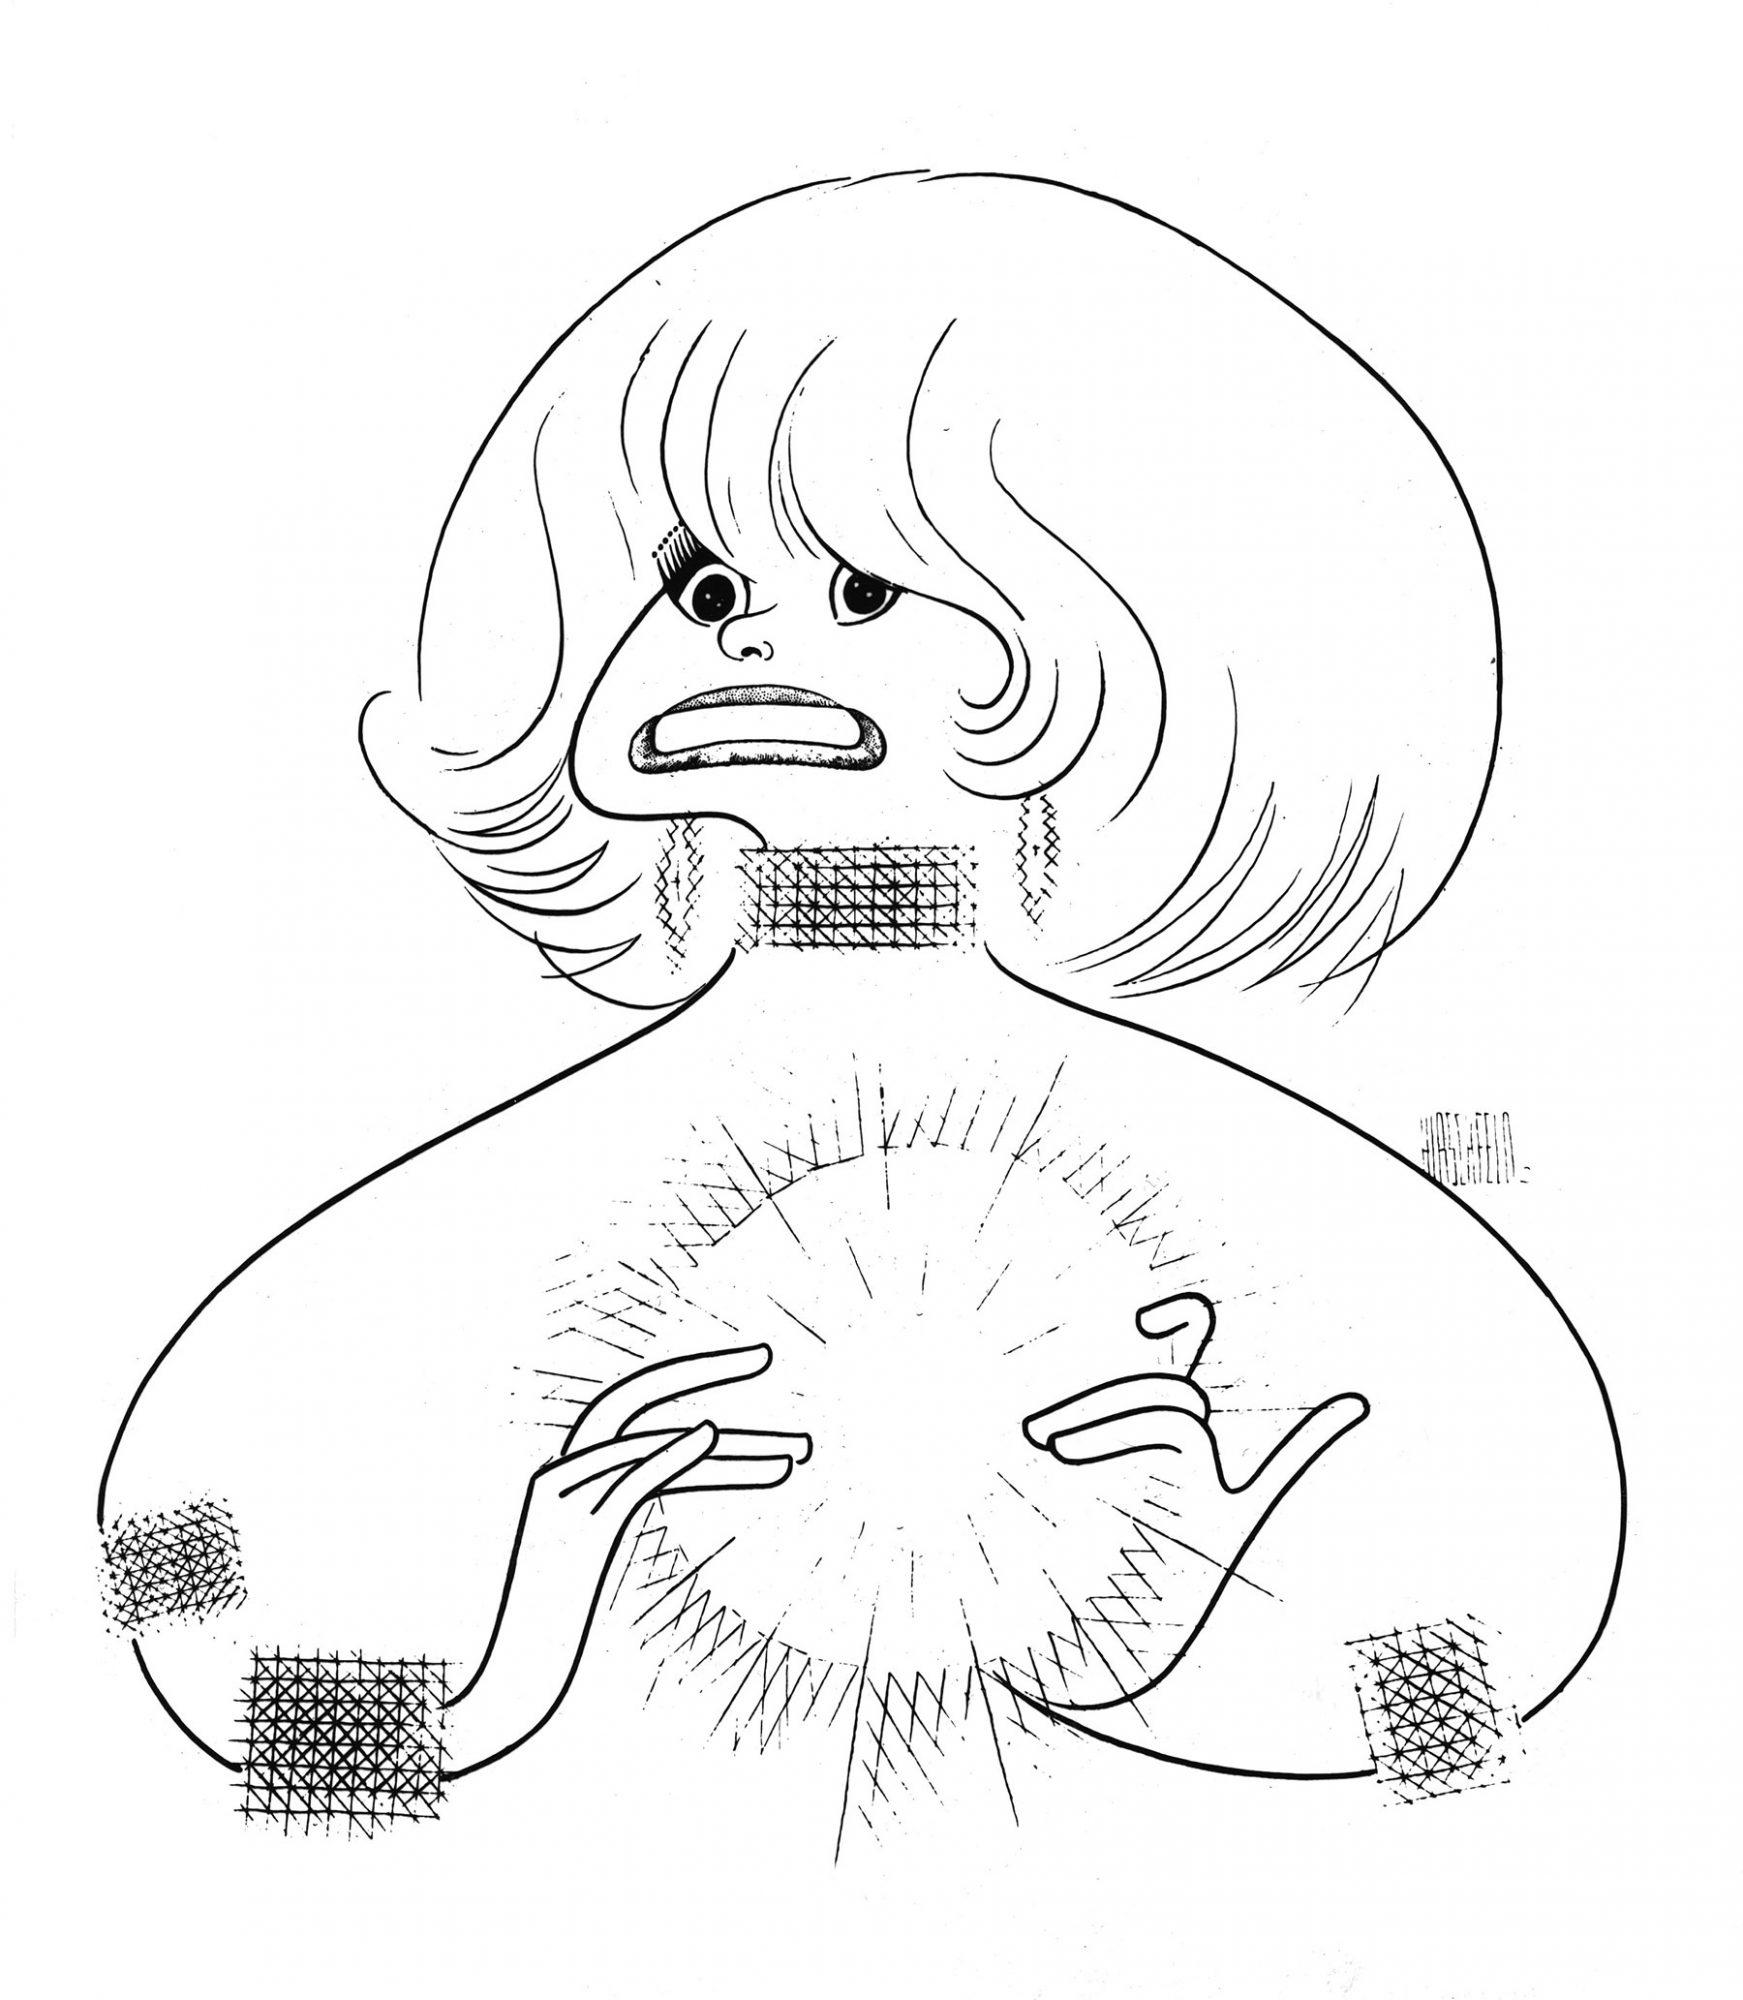 1874.jpg –Carol Channing in Gentlemen Prefer Blondes, 1973